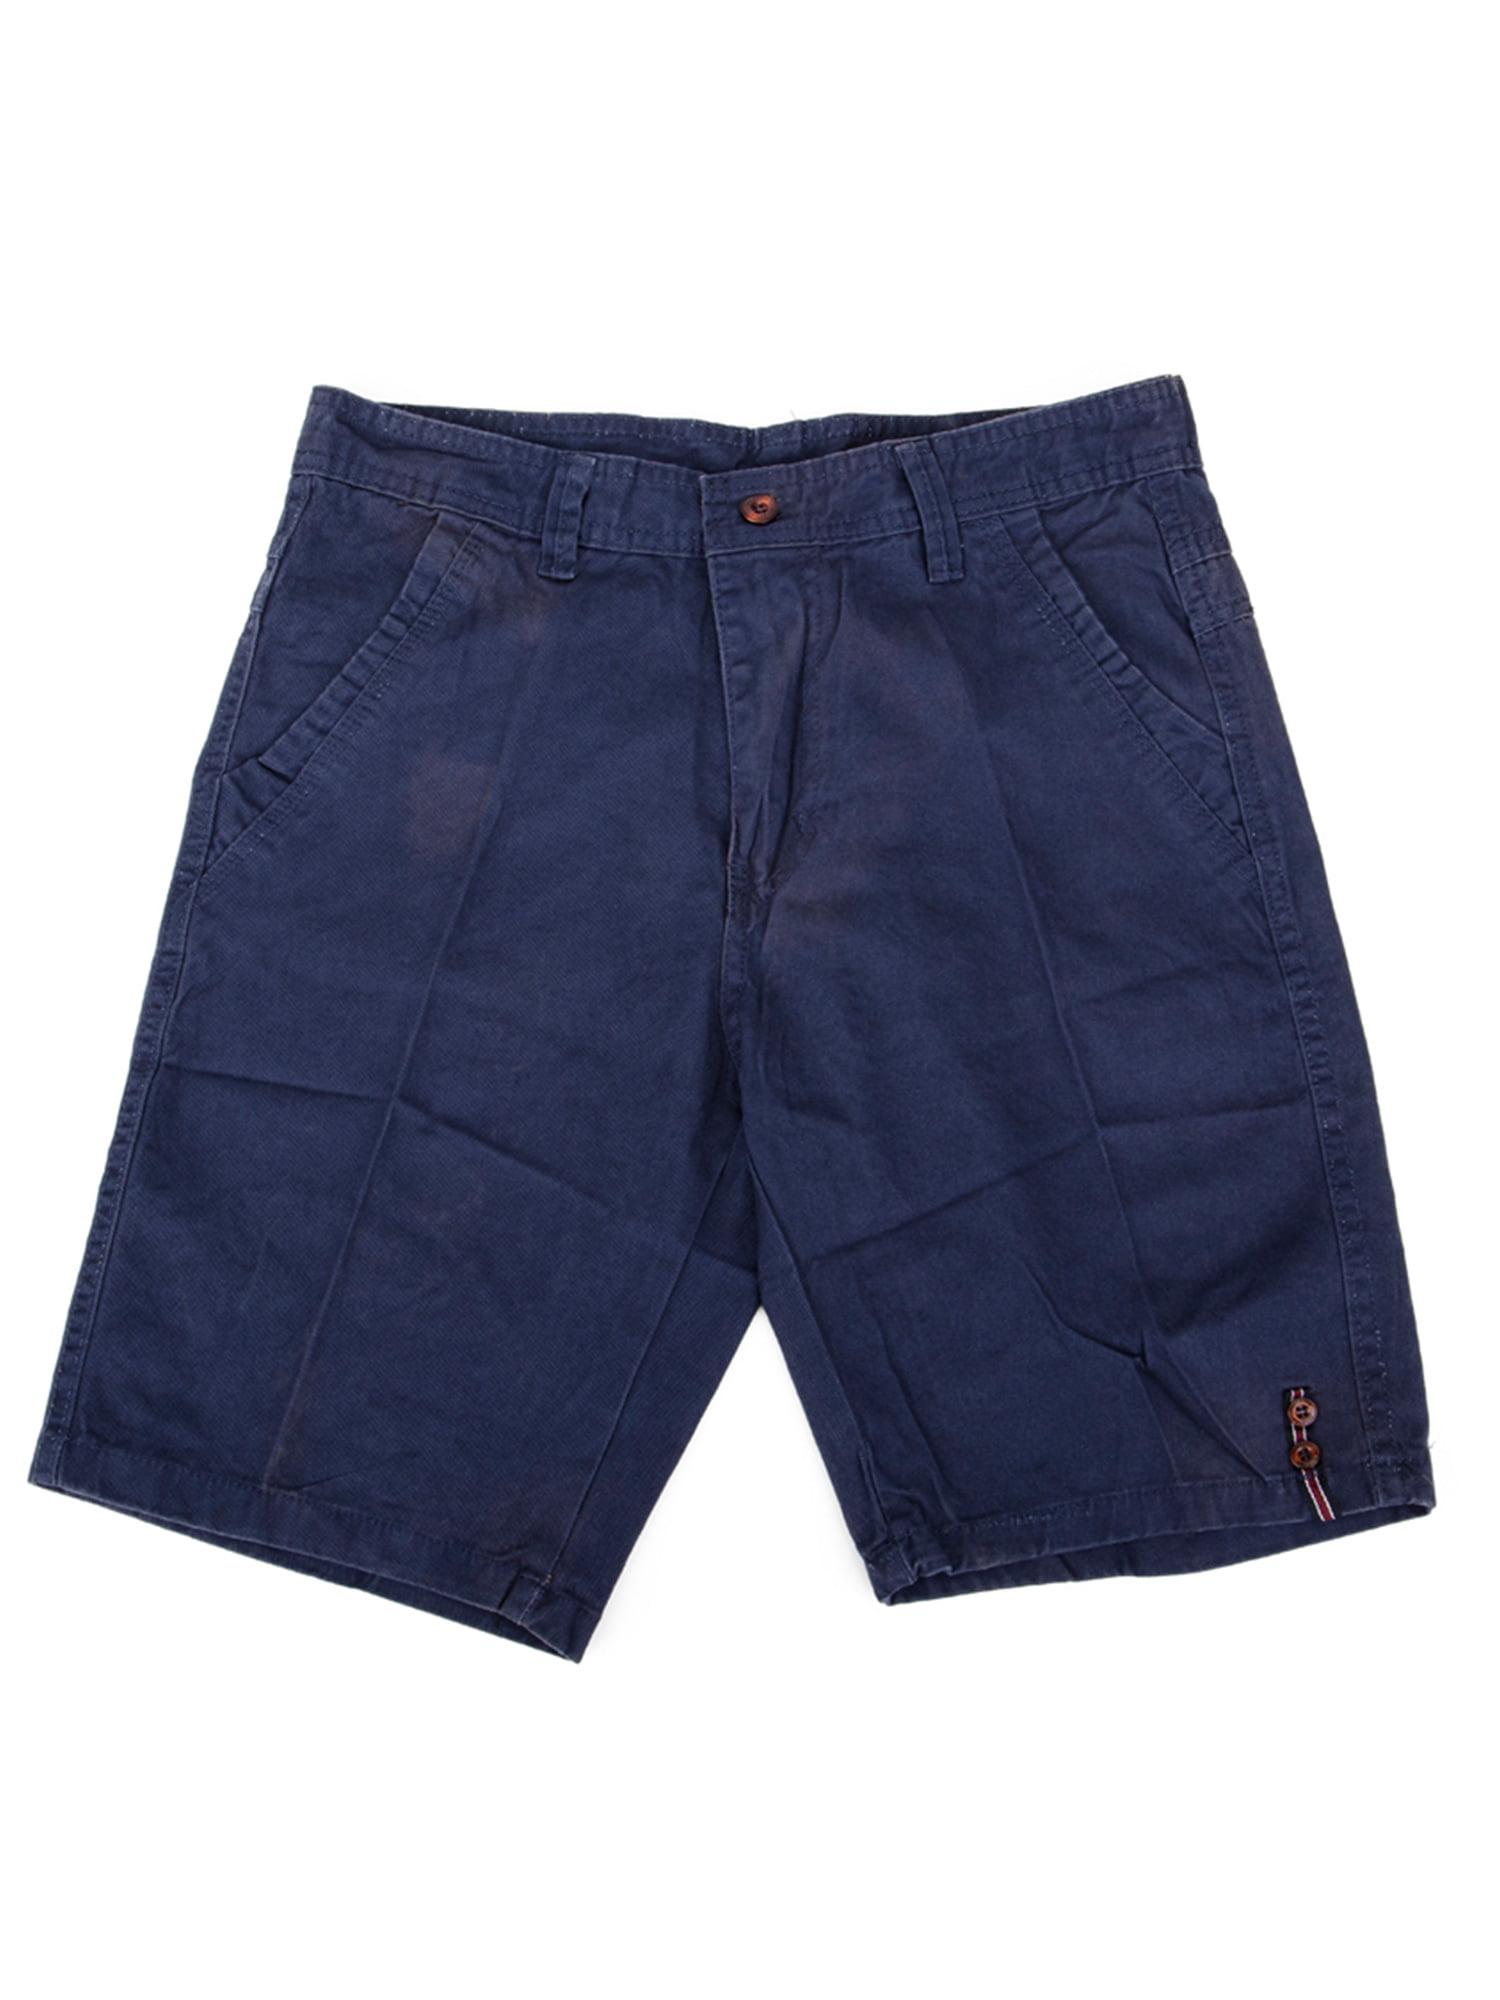 Mens Big & Tall Cargo Shorts Baggy Navy Blue BDU Cotton Cargo Short